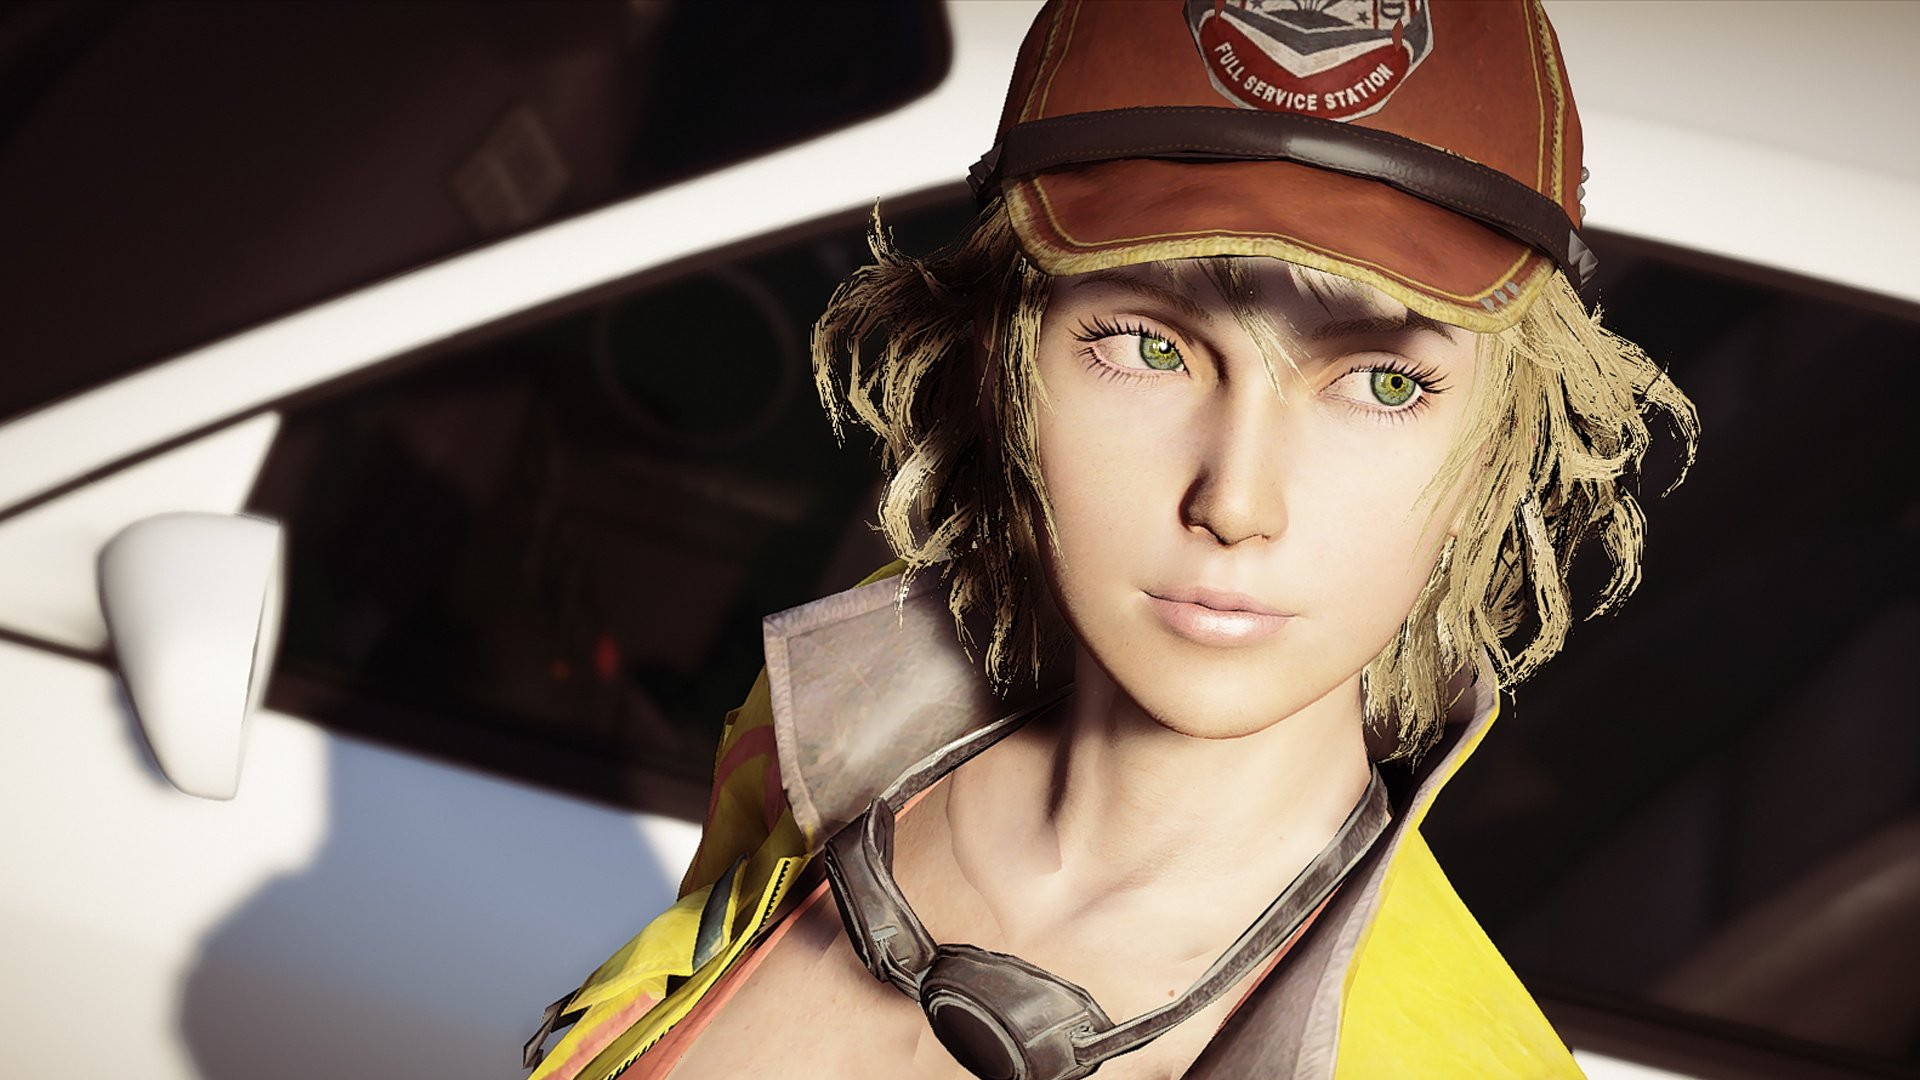 Noctis Lucis Caelum Cindy Aurum Final Fantasy Xv Add On Ped